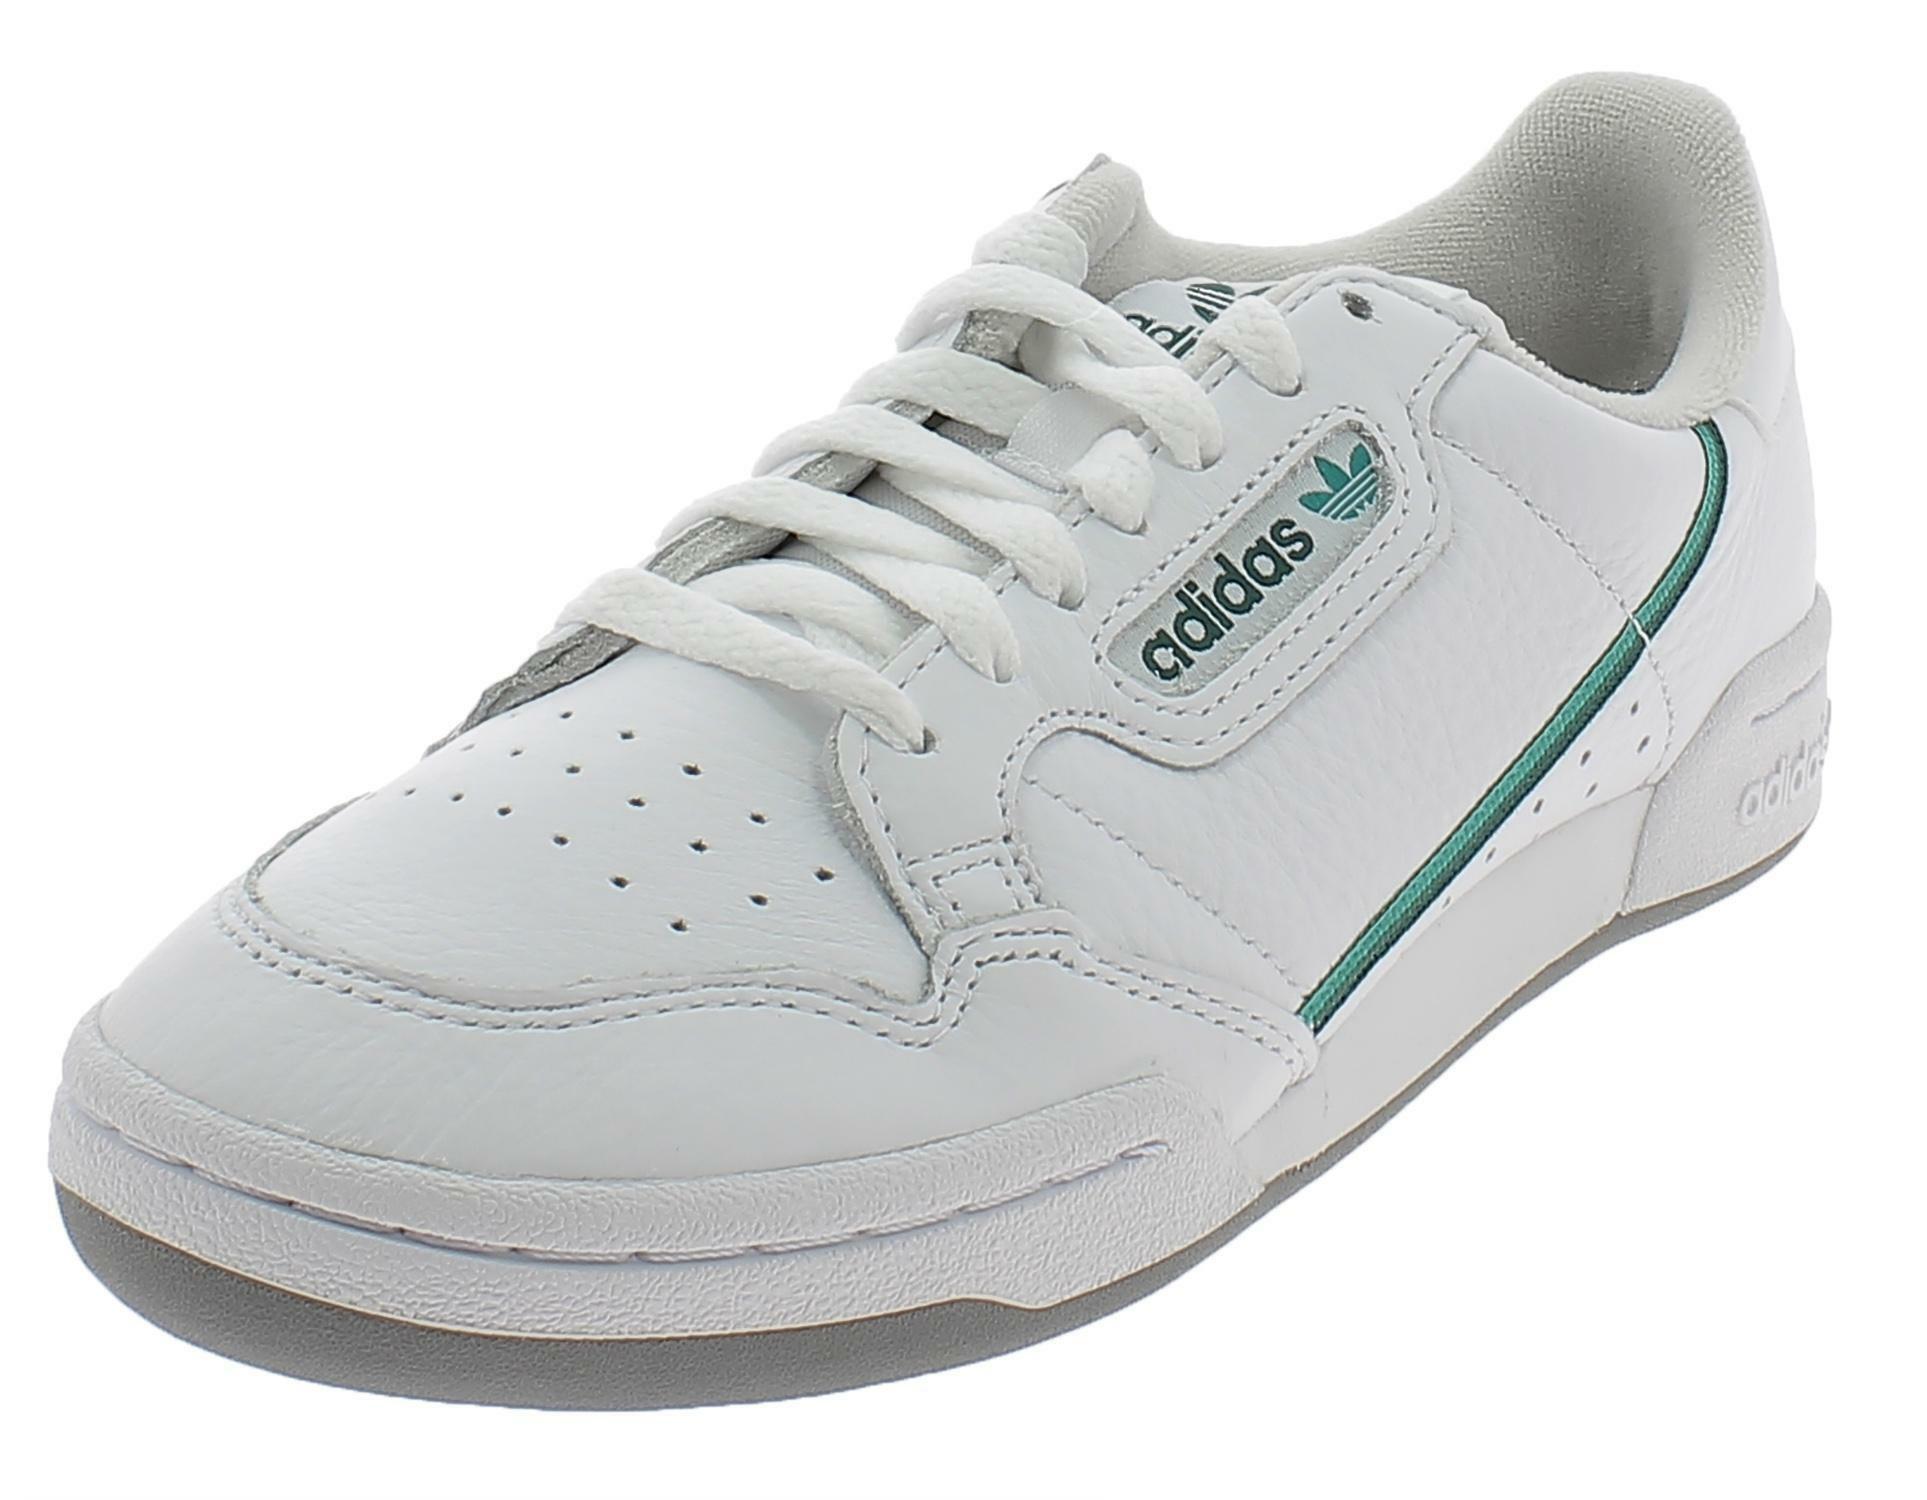 adidas adidas continental 80 scarpe sportive uomo bianche ef5990